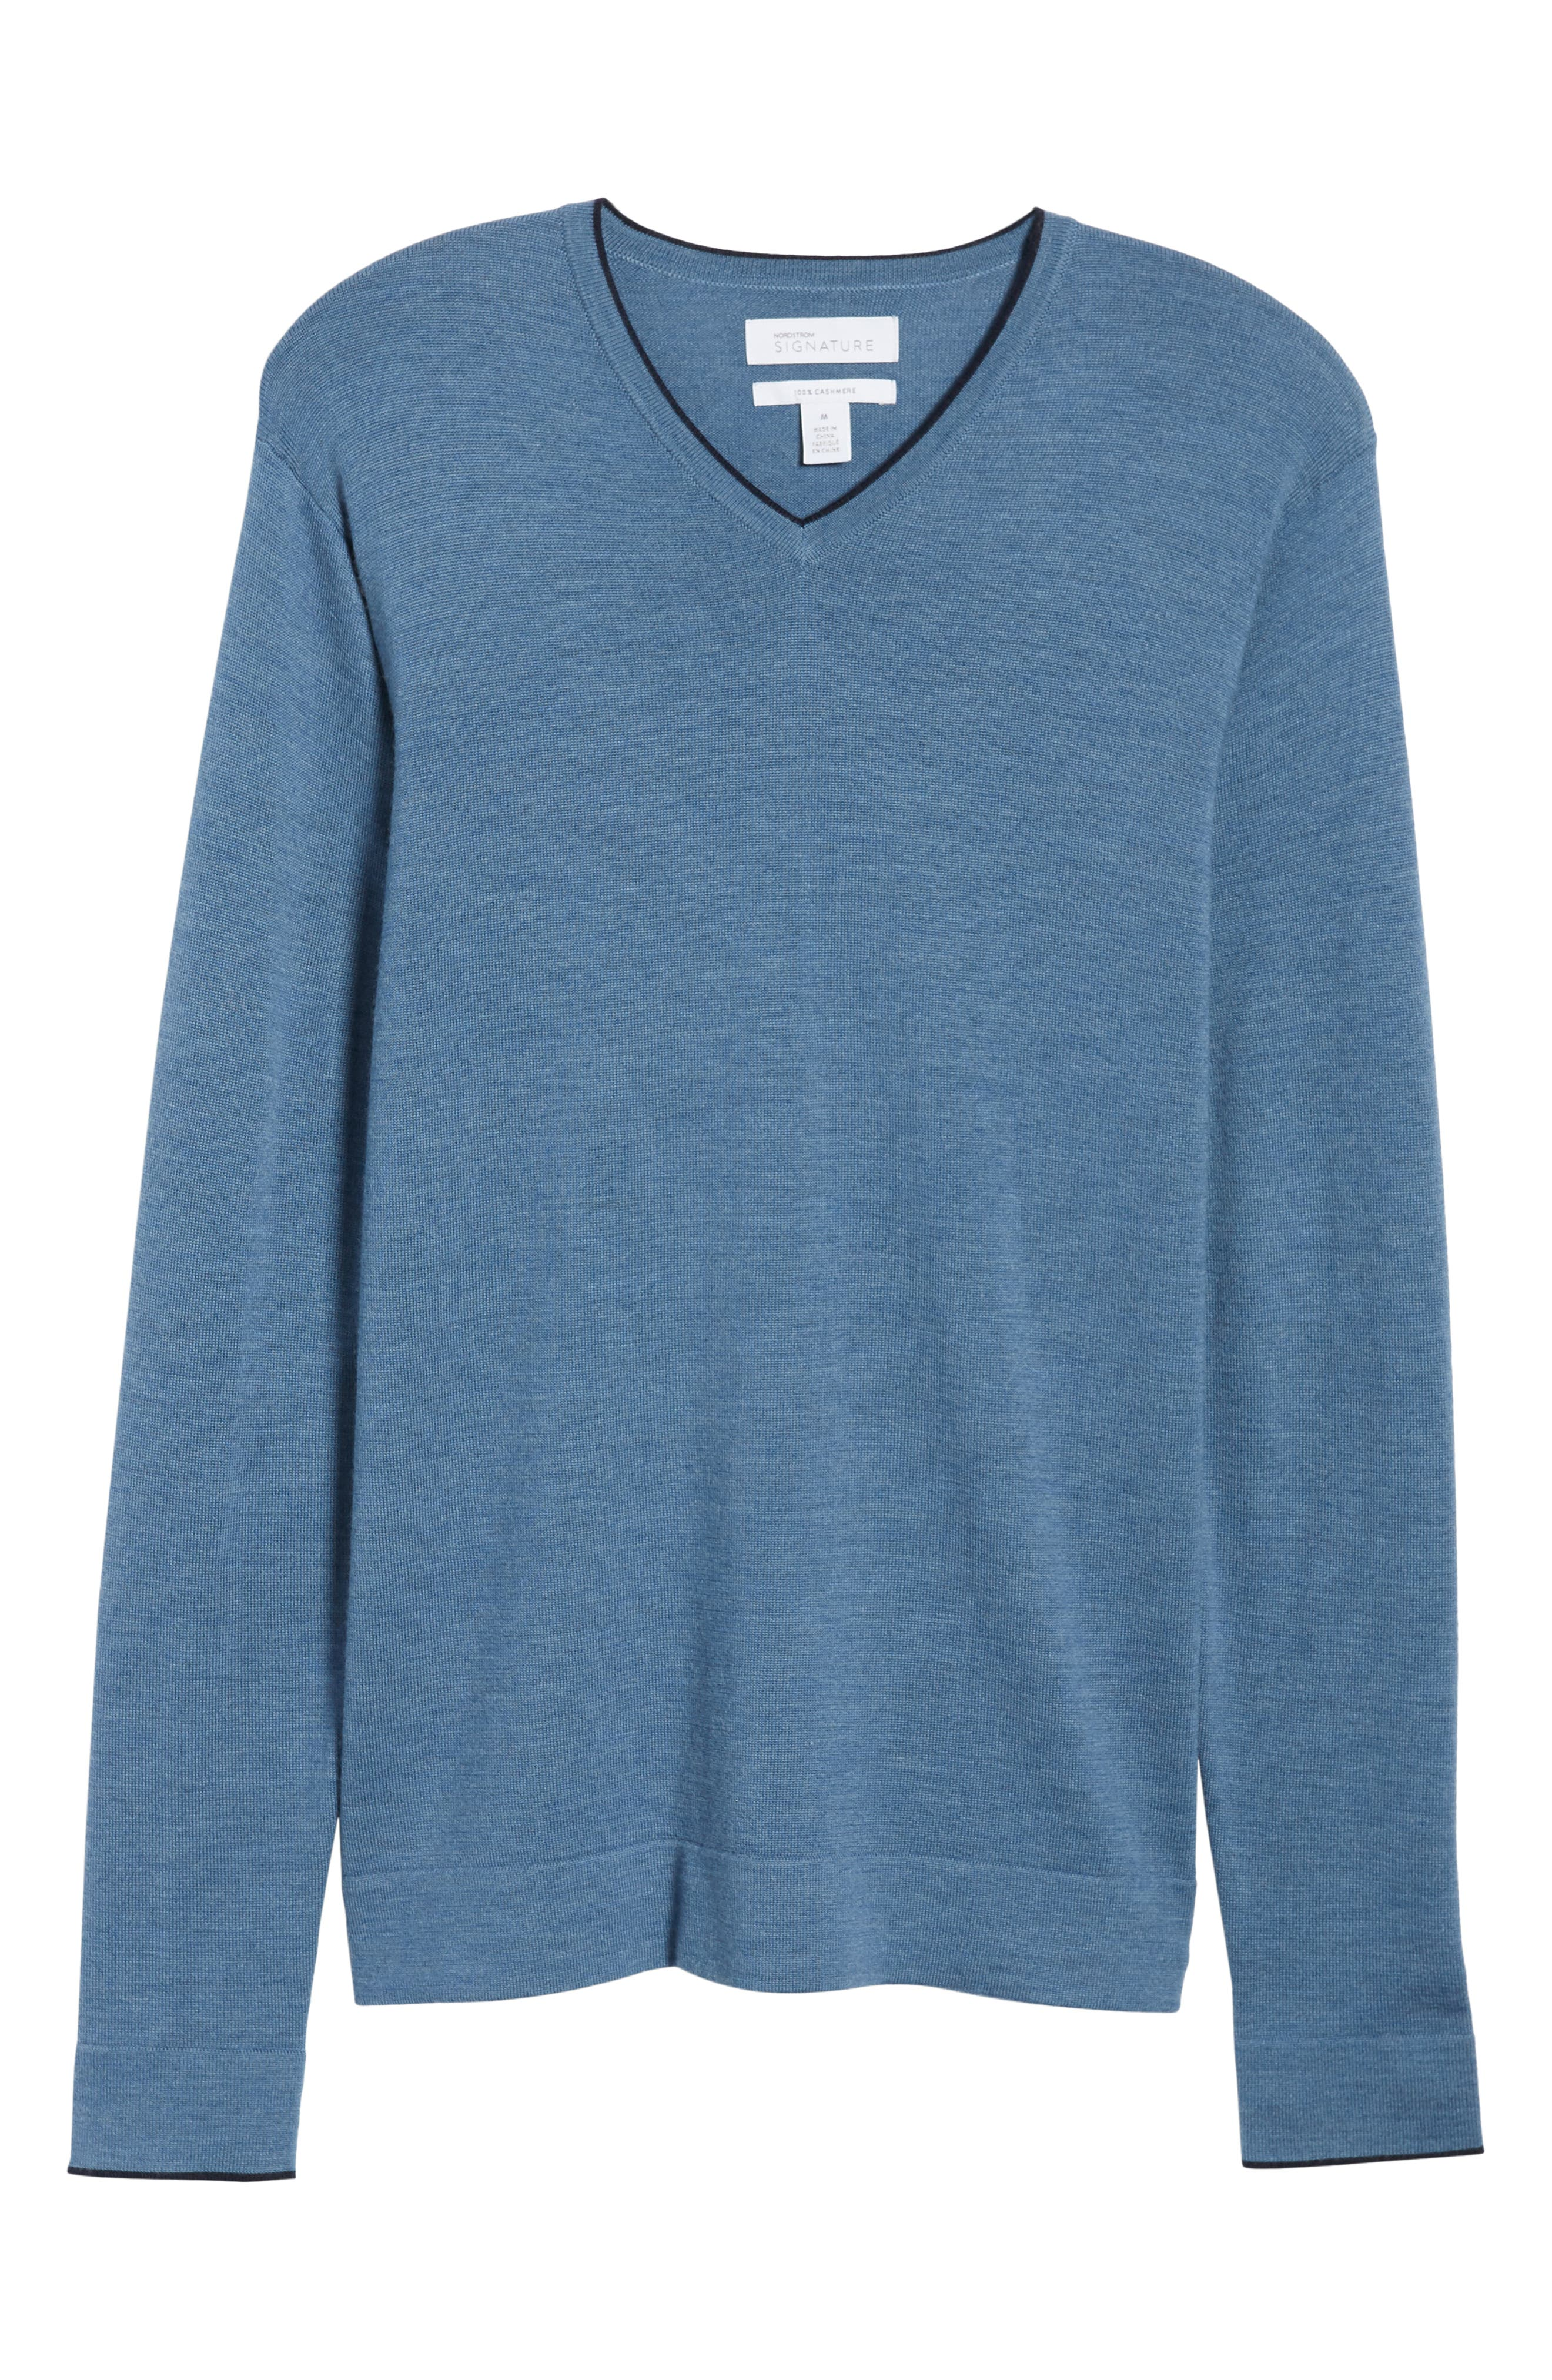 Nordstrom Signature Merino Wool Blend V-Neck Sweater